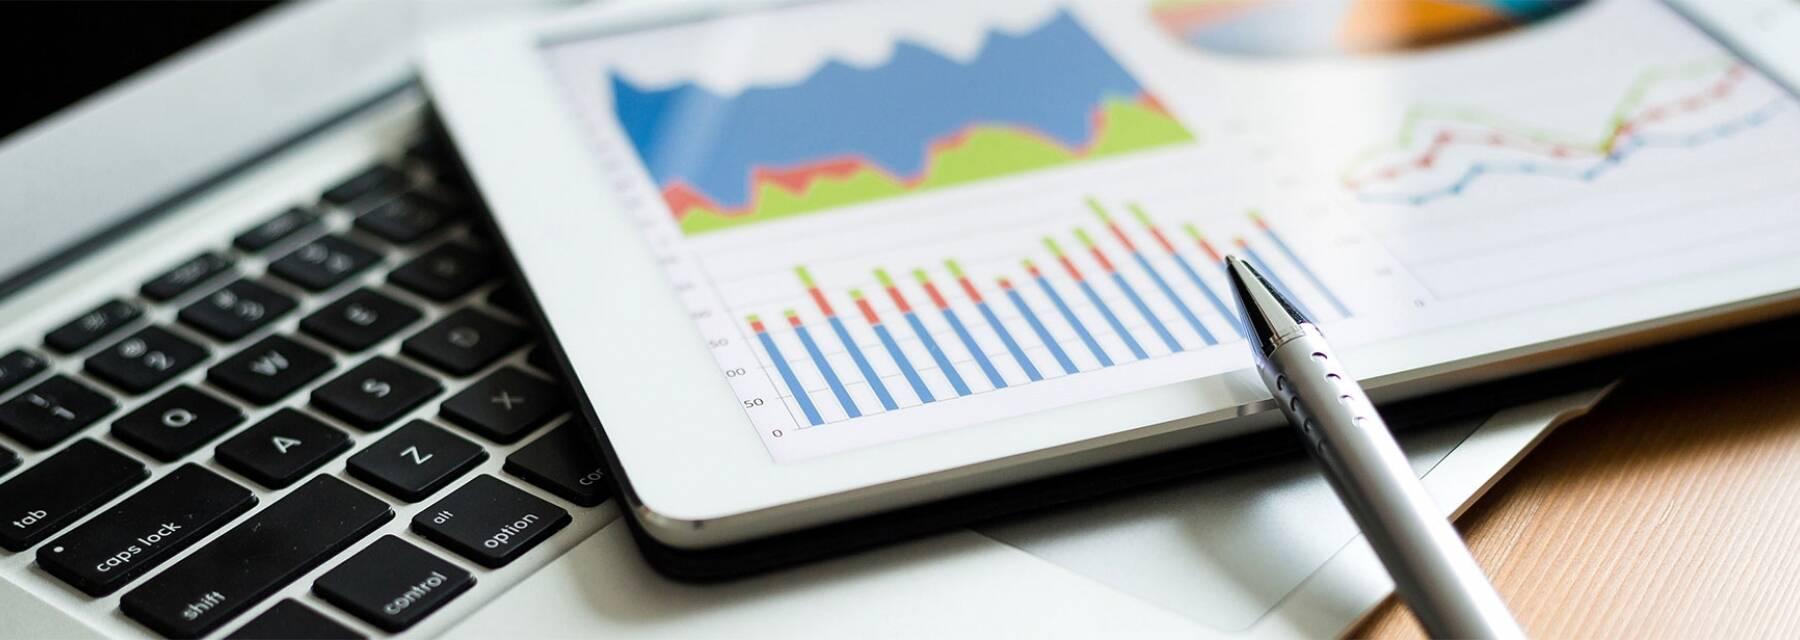 web-analytics-business-analytics-services